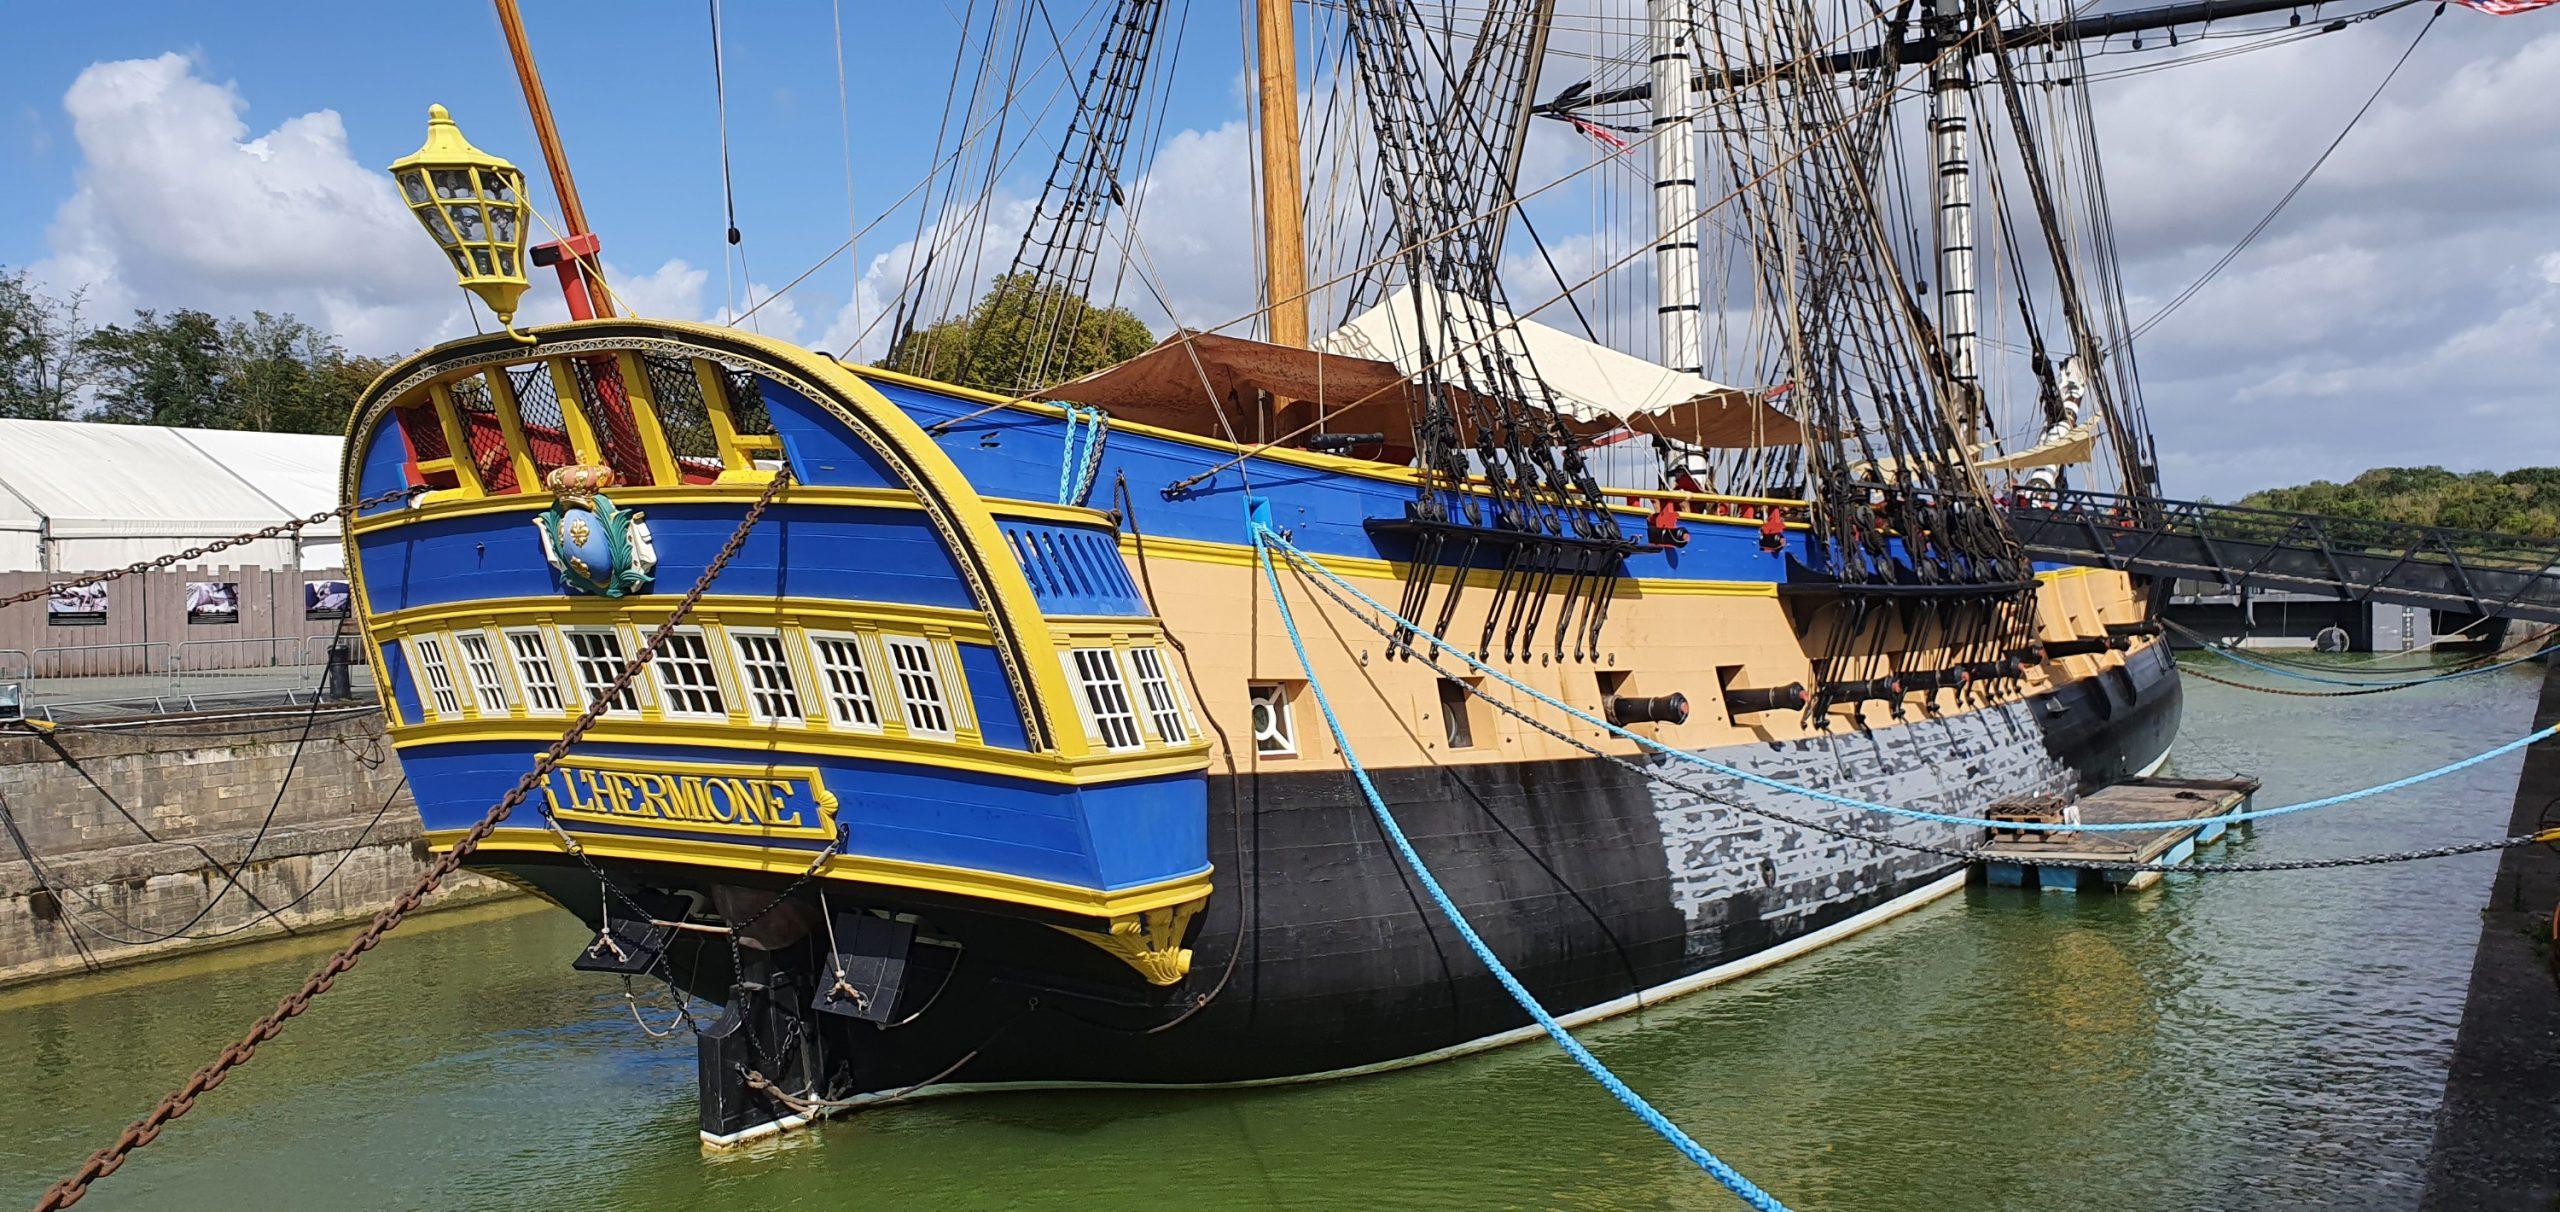 25 septembre : Rochefort